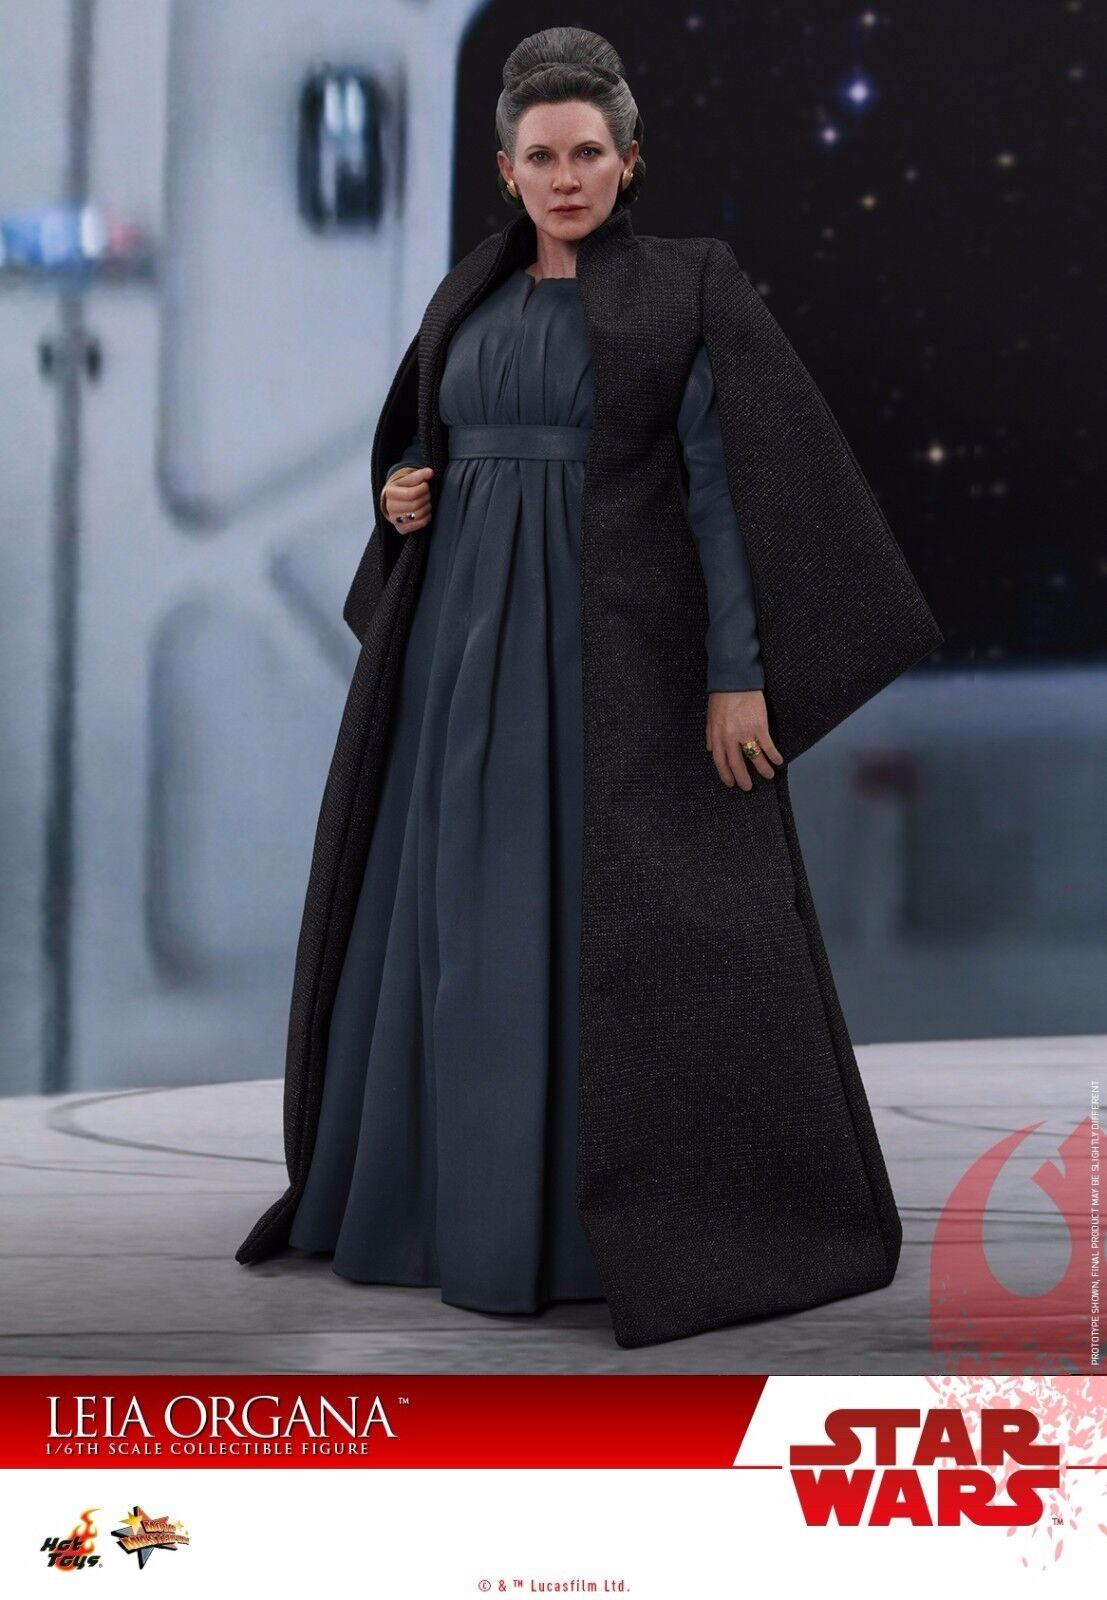 HOT TOYS MMS459 Estrella Wars Jedi Leia Organa la última figura de Cocherie Fisher 1 6